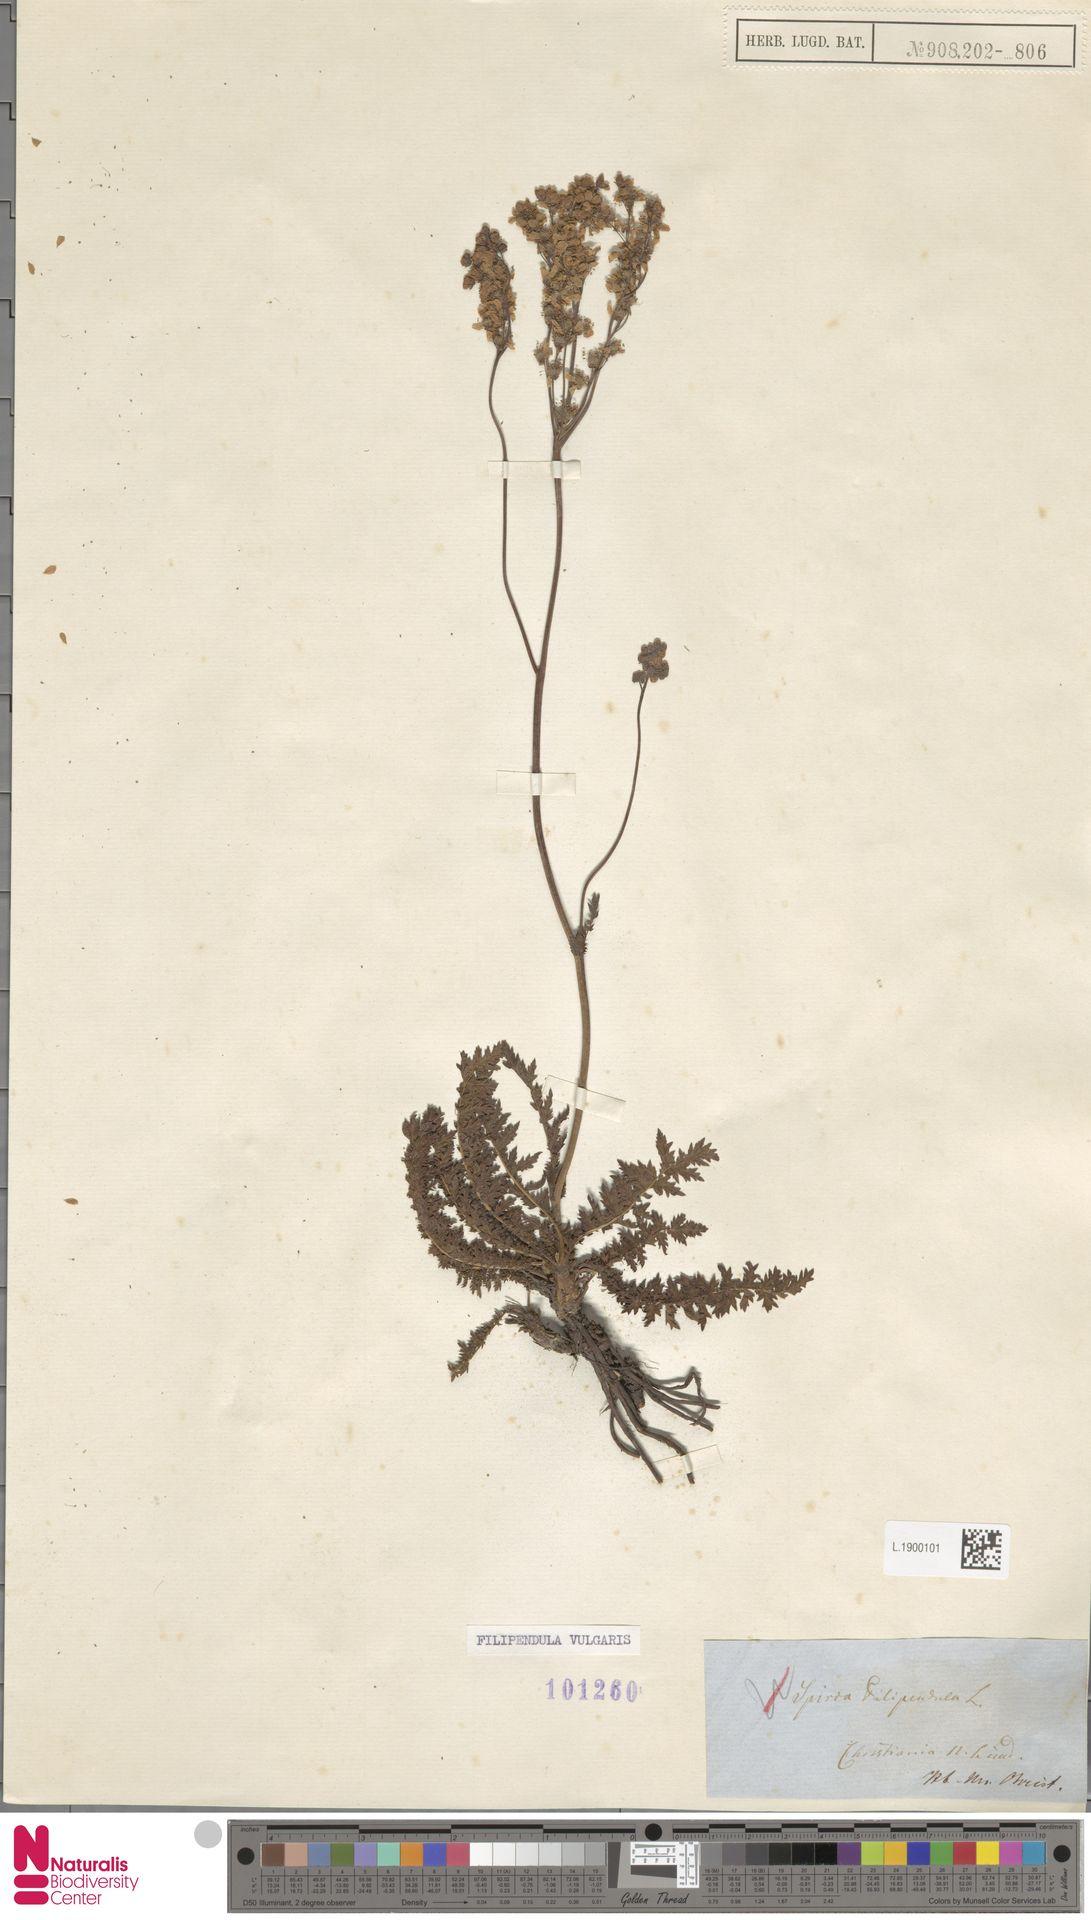 L.1900101 | Filipendula vulgaris Moench